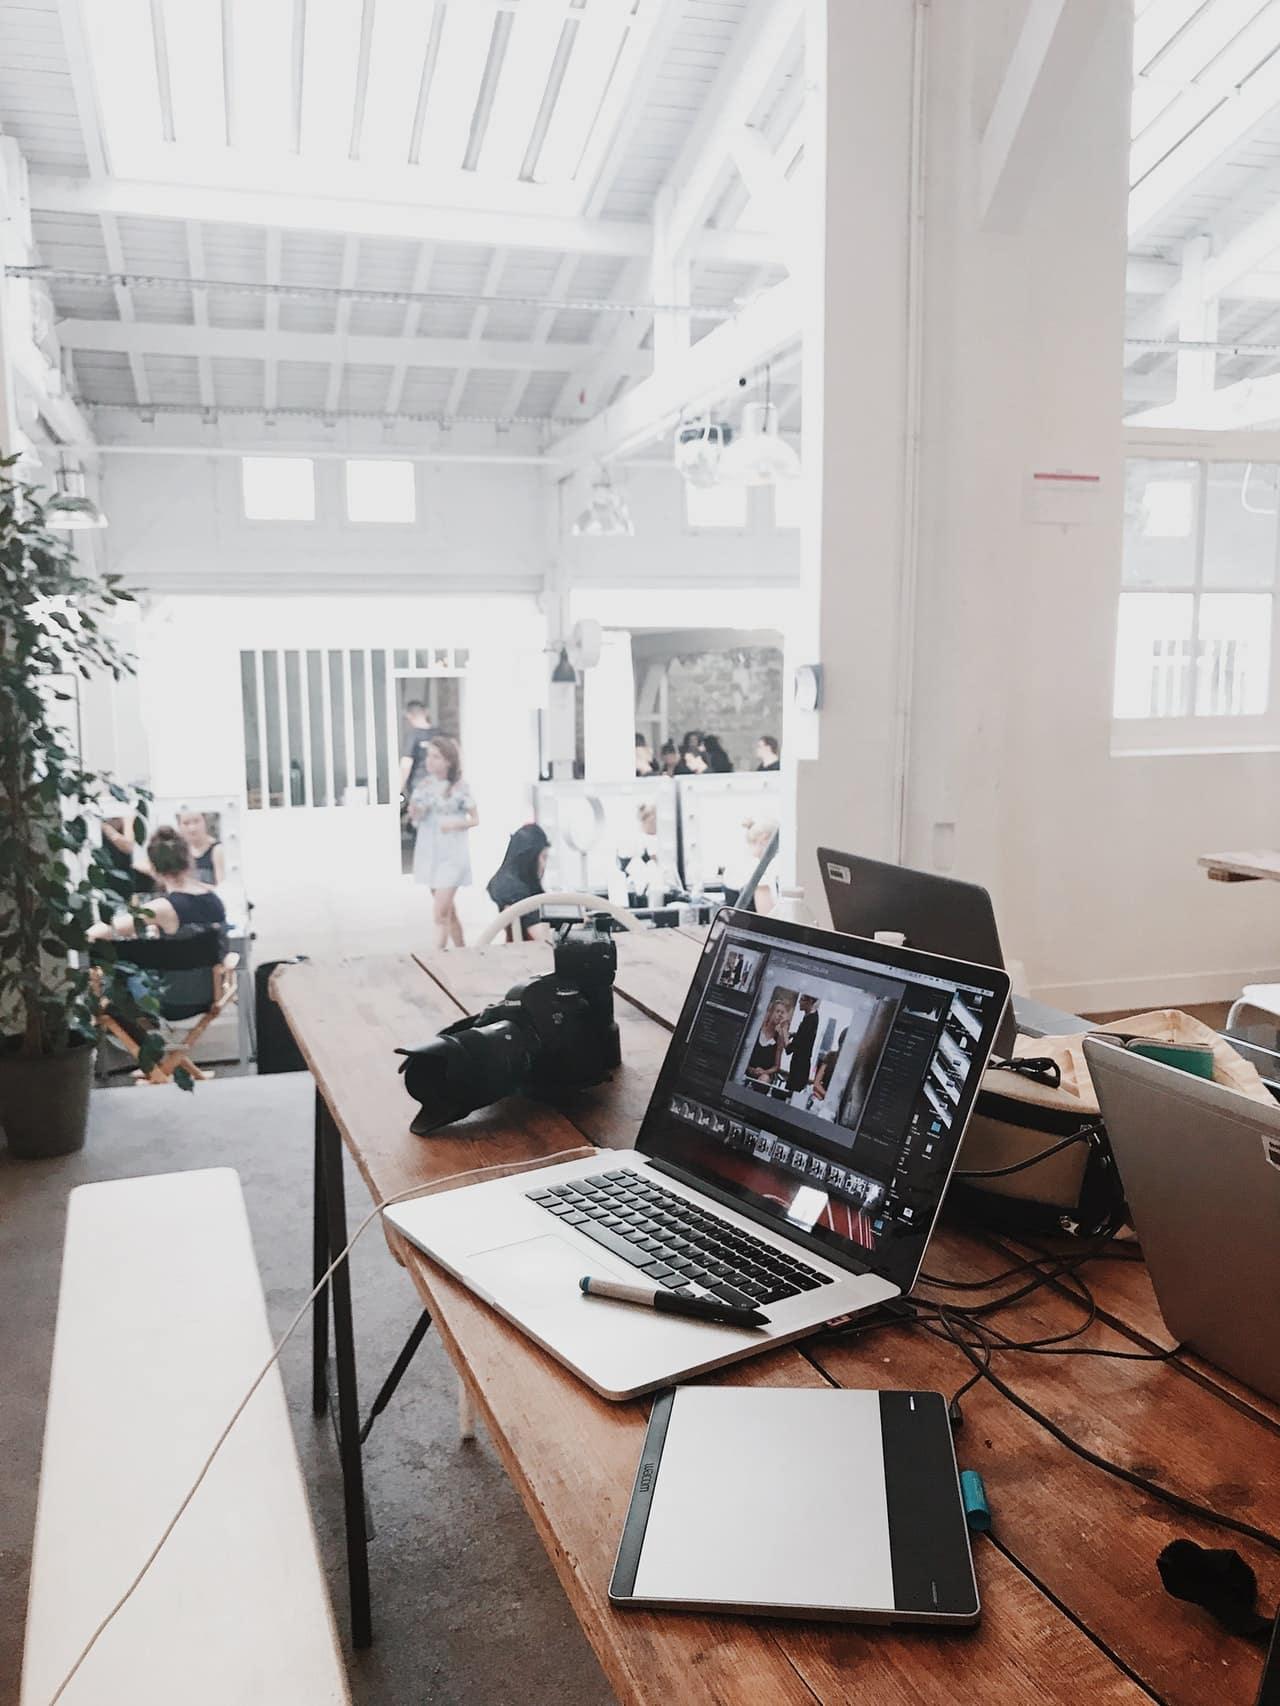 Choosing Marketing Agency Article Image